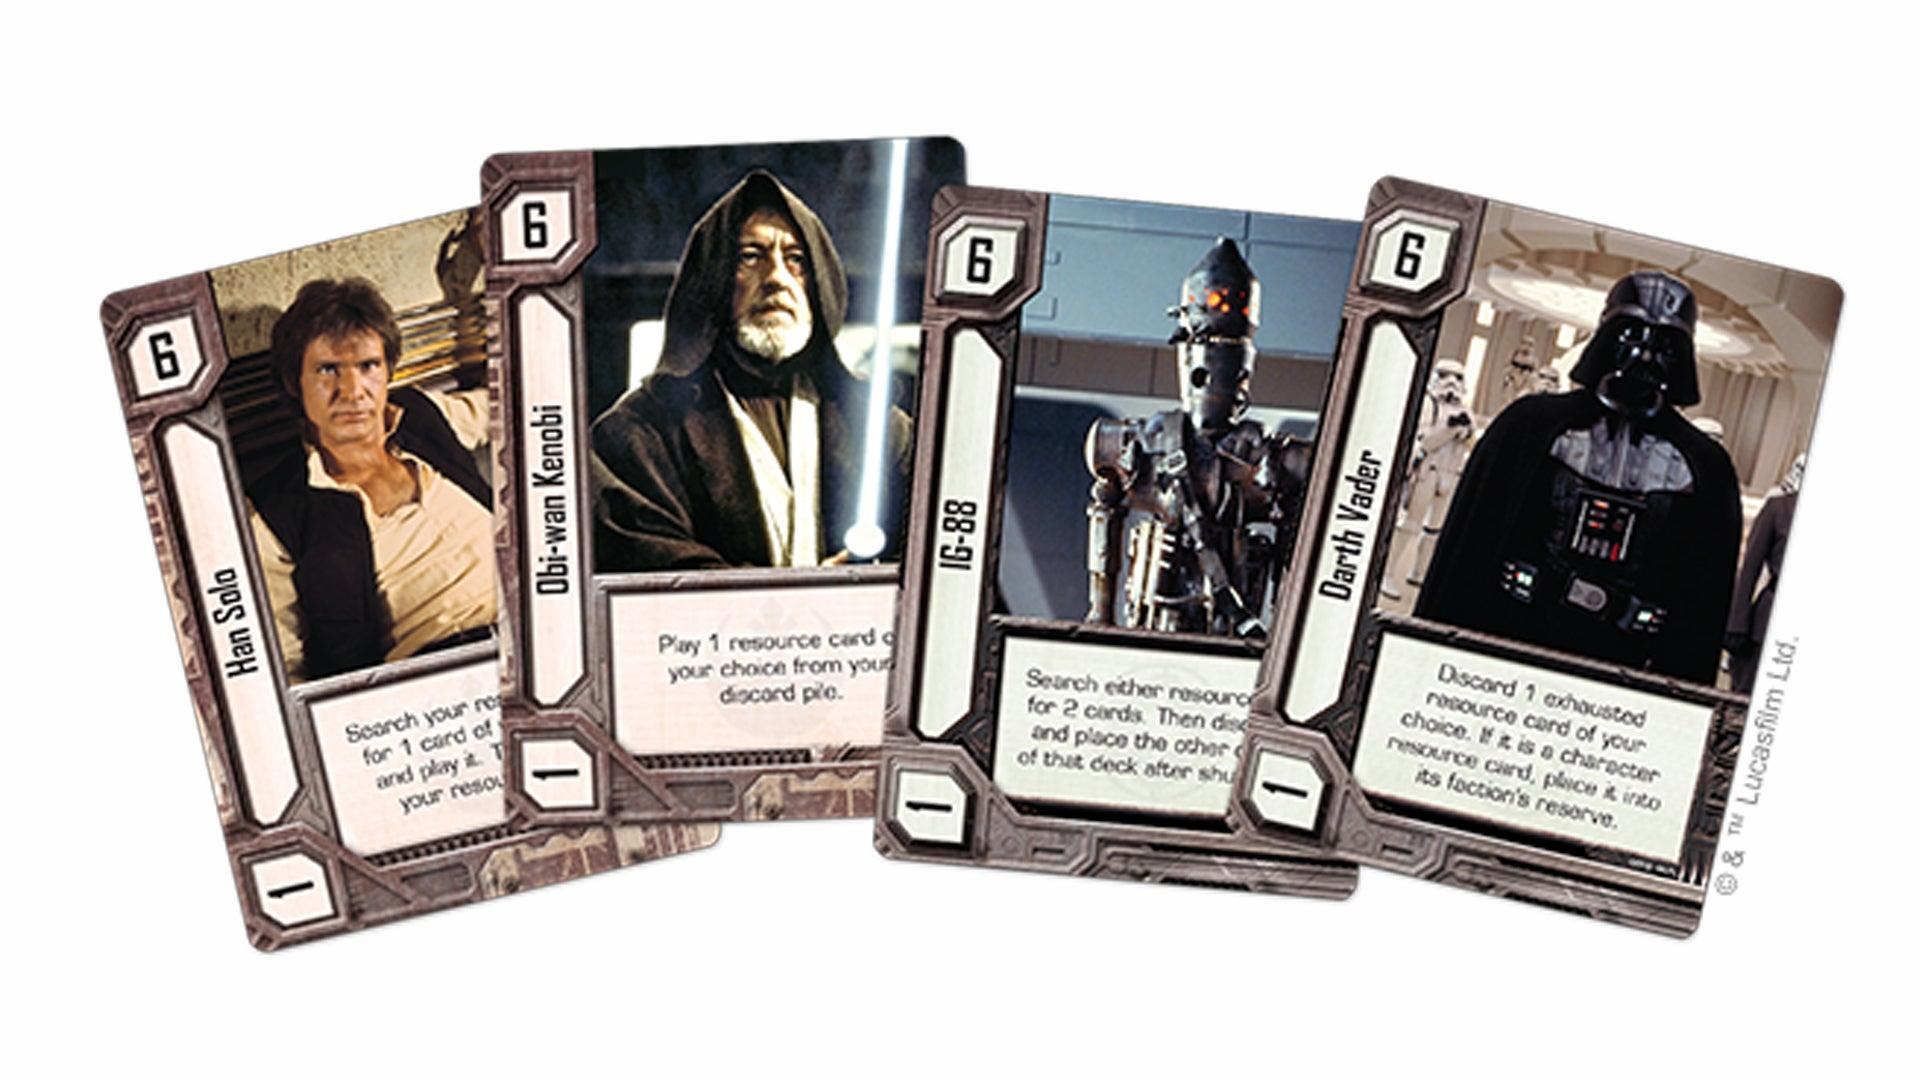 Star Wars: Empire vs. Rebellion board game cards